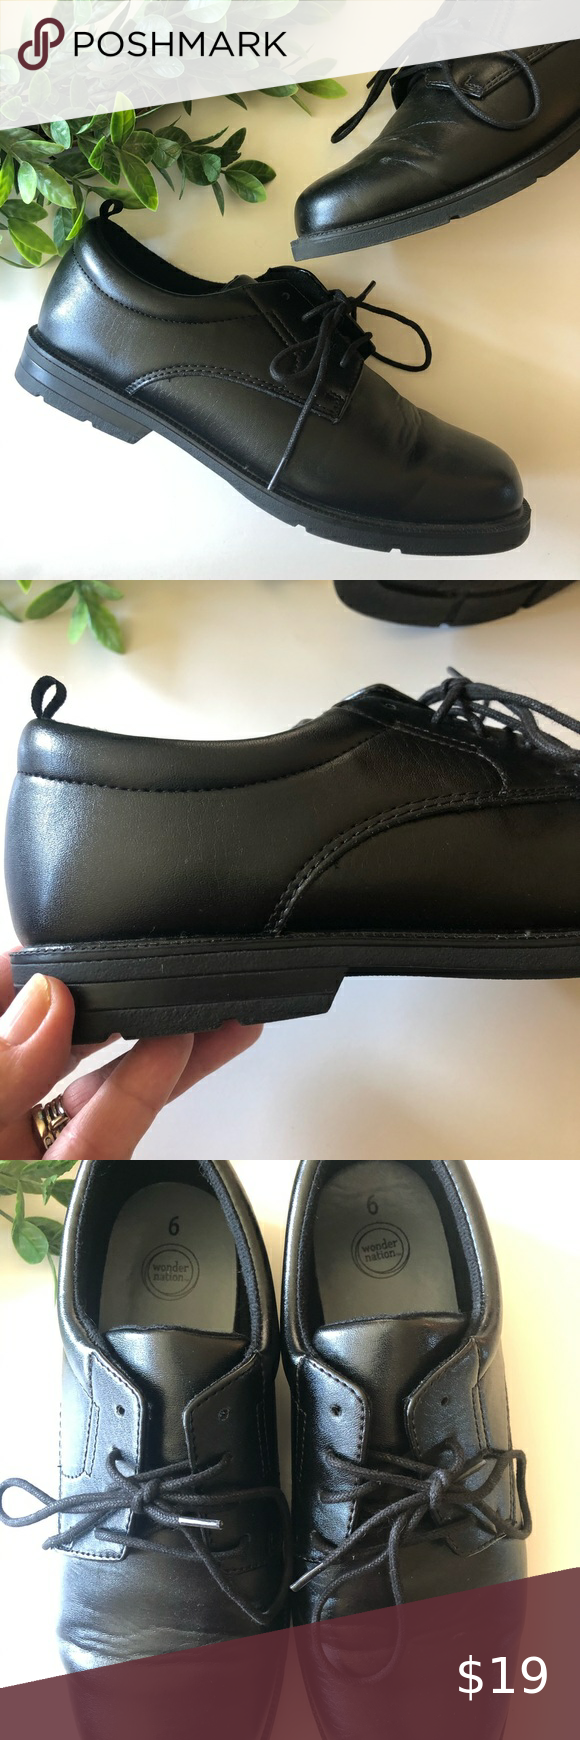 Last Chance Black Dress Shoes Sz 6 Black Dress Shoes Dress Shoes Shoes [ 1740 x 580 Pixel ]